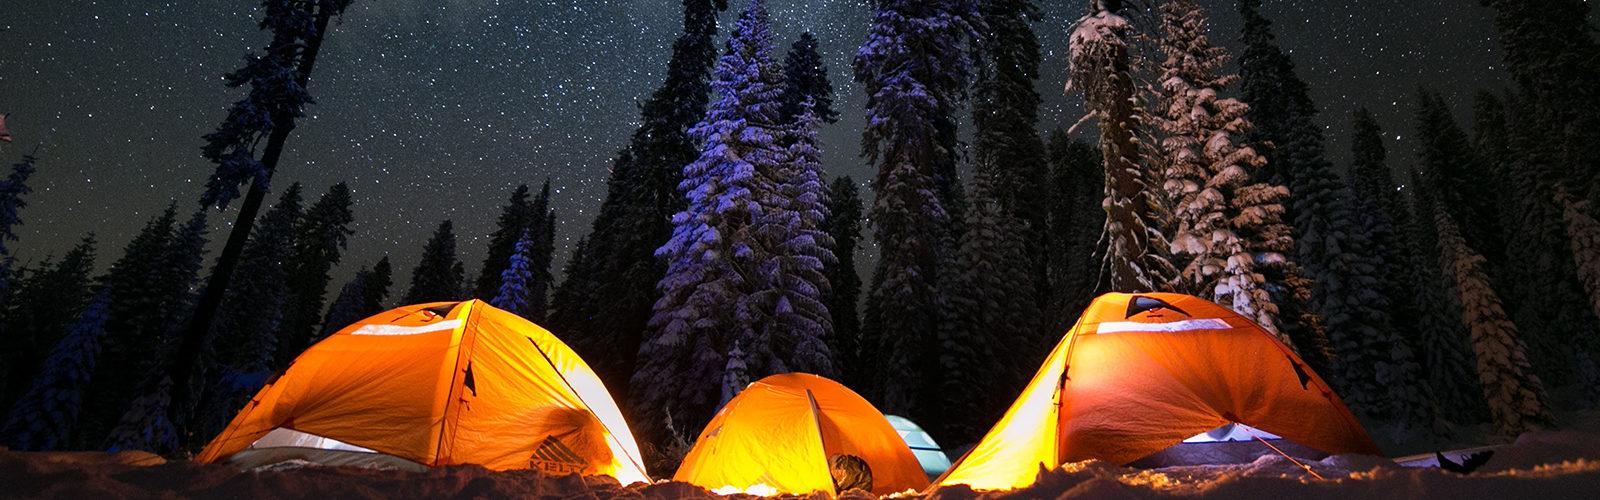 camper-endroit-sinsolites-camping-etats-unis